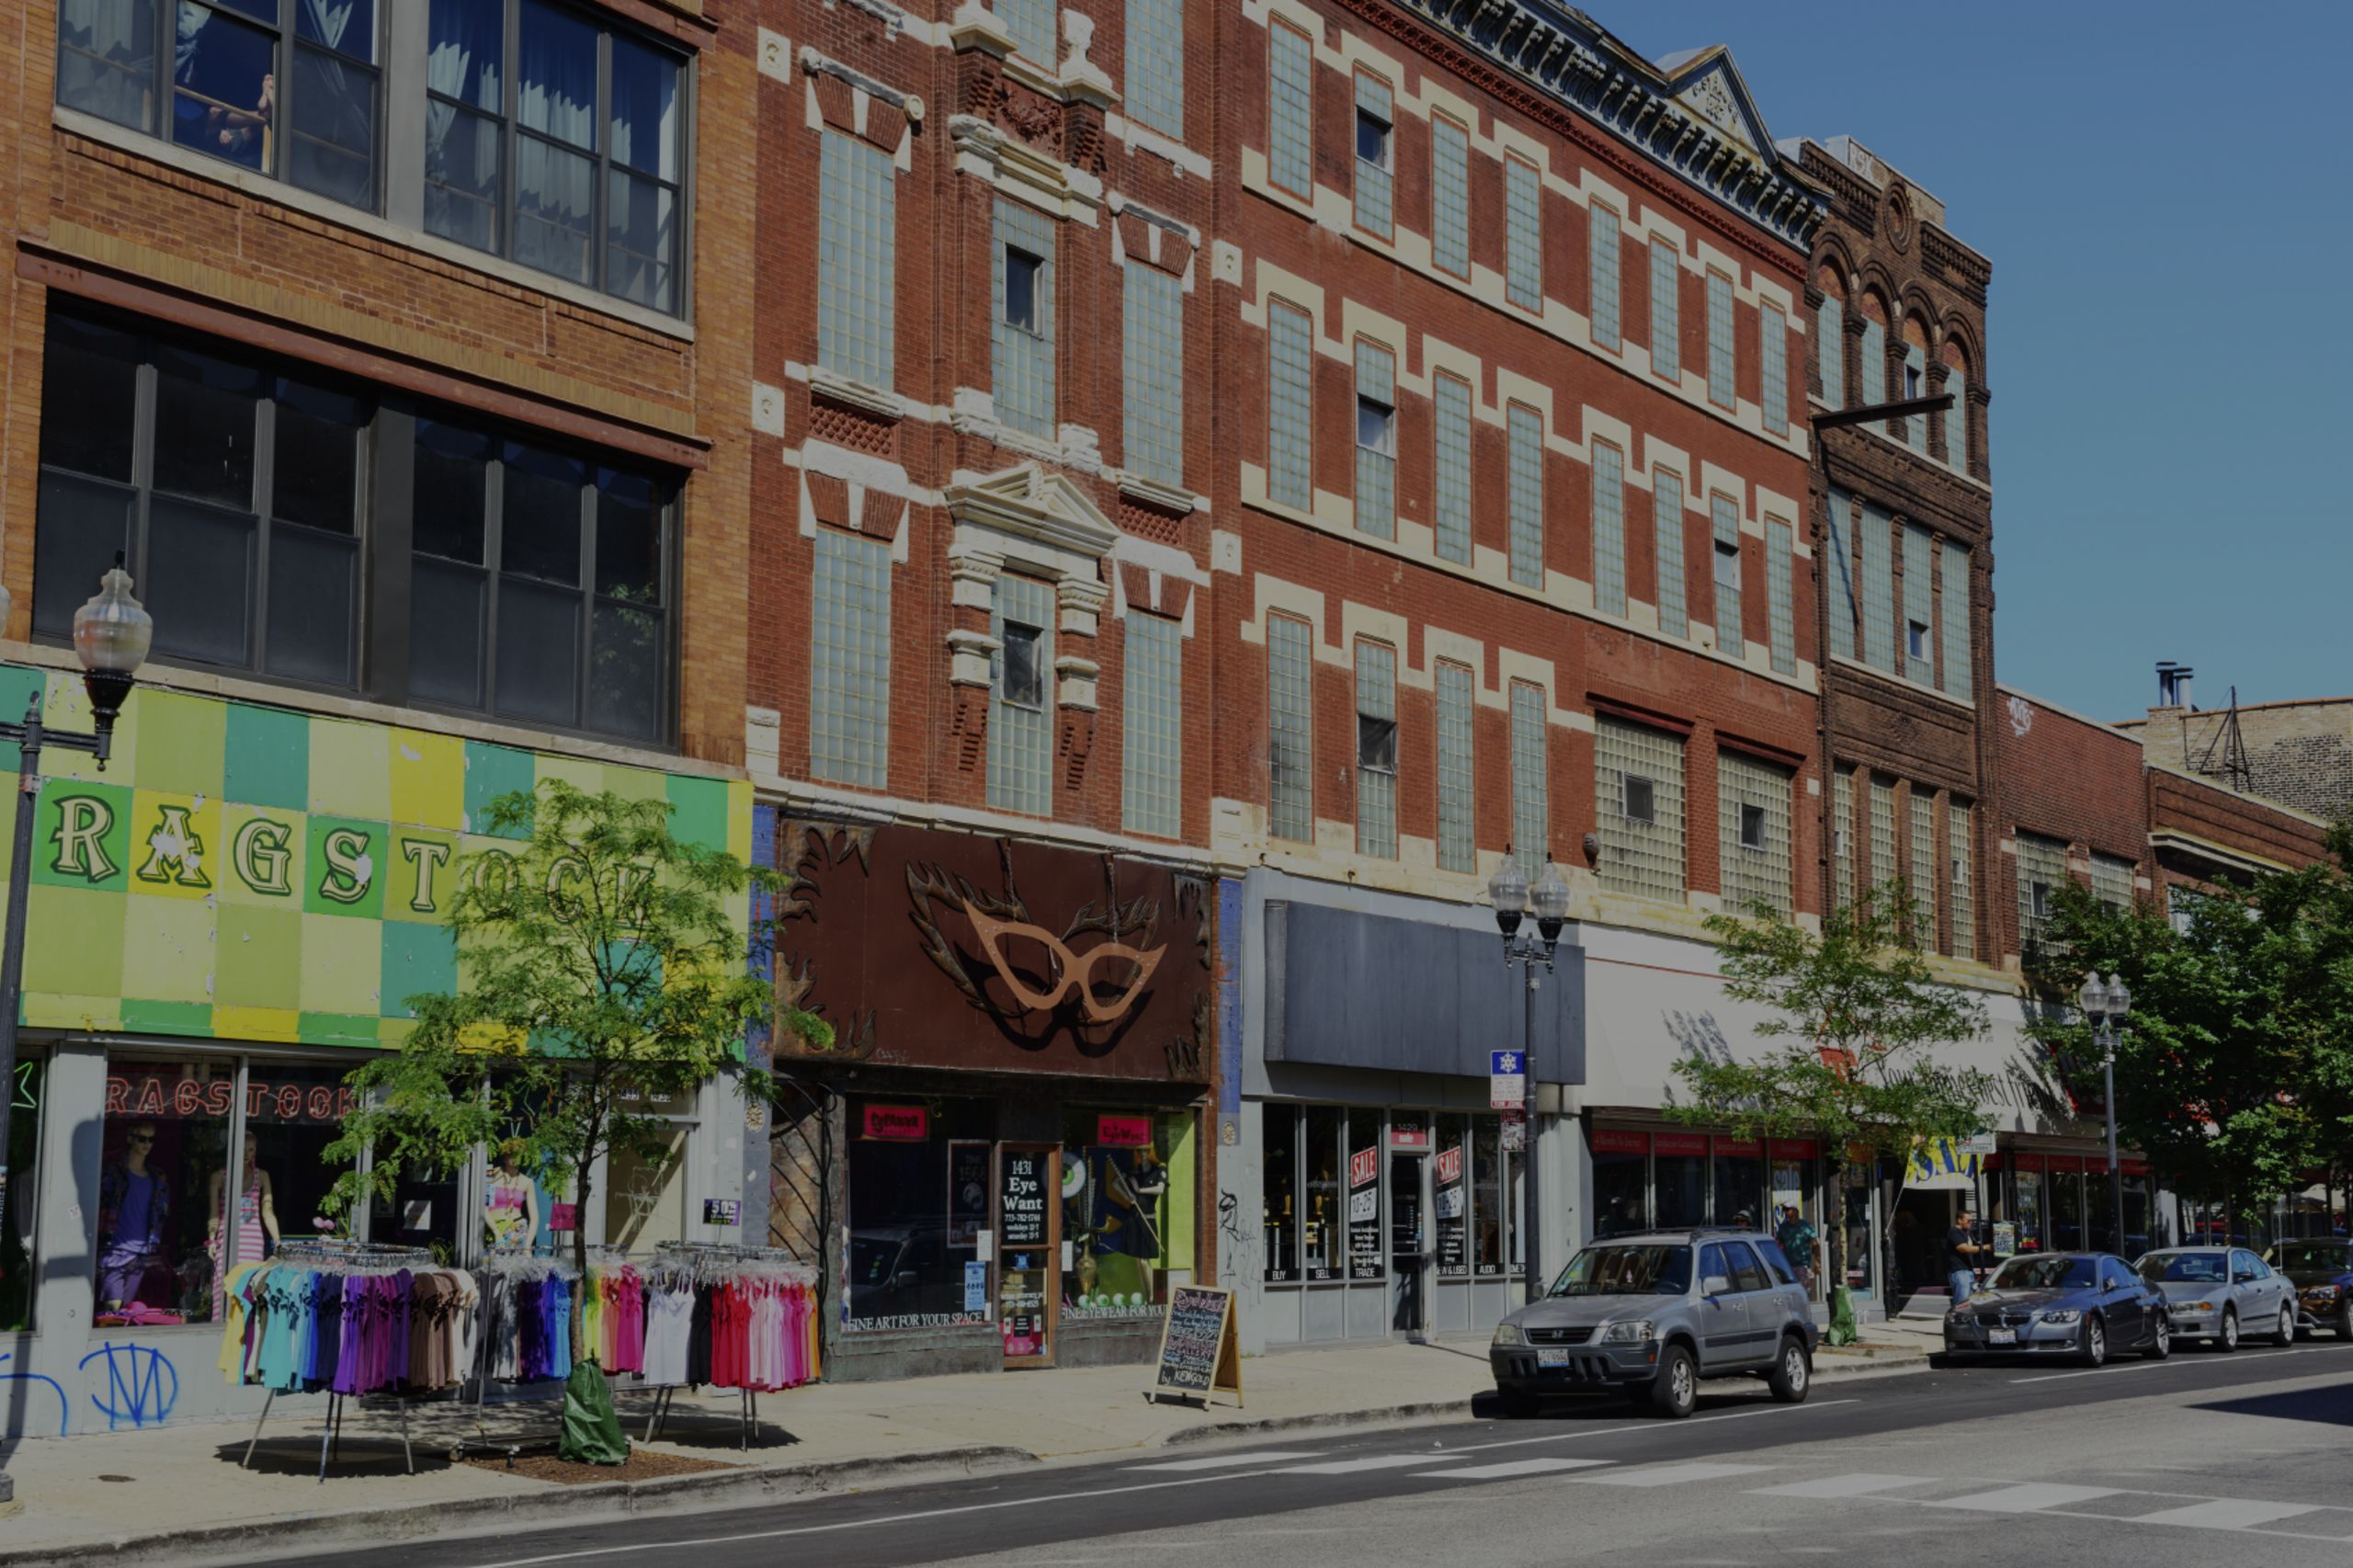 Chicago Neighborhood Tour: Bucktown